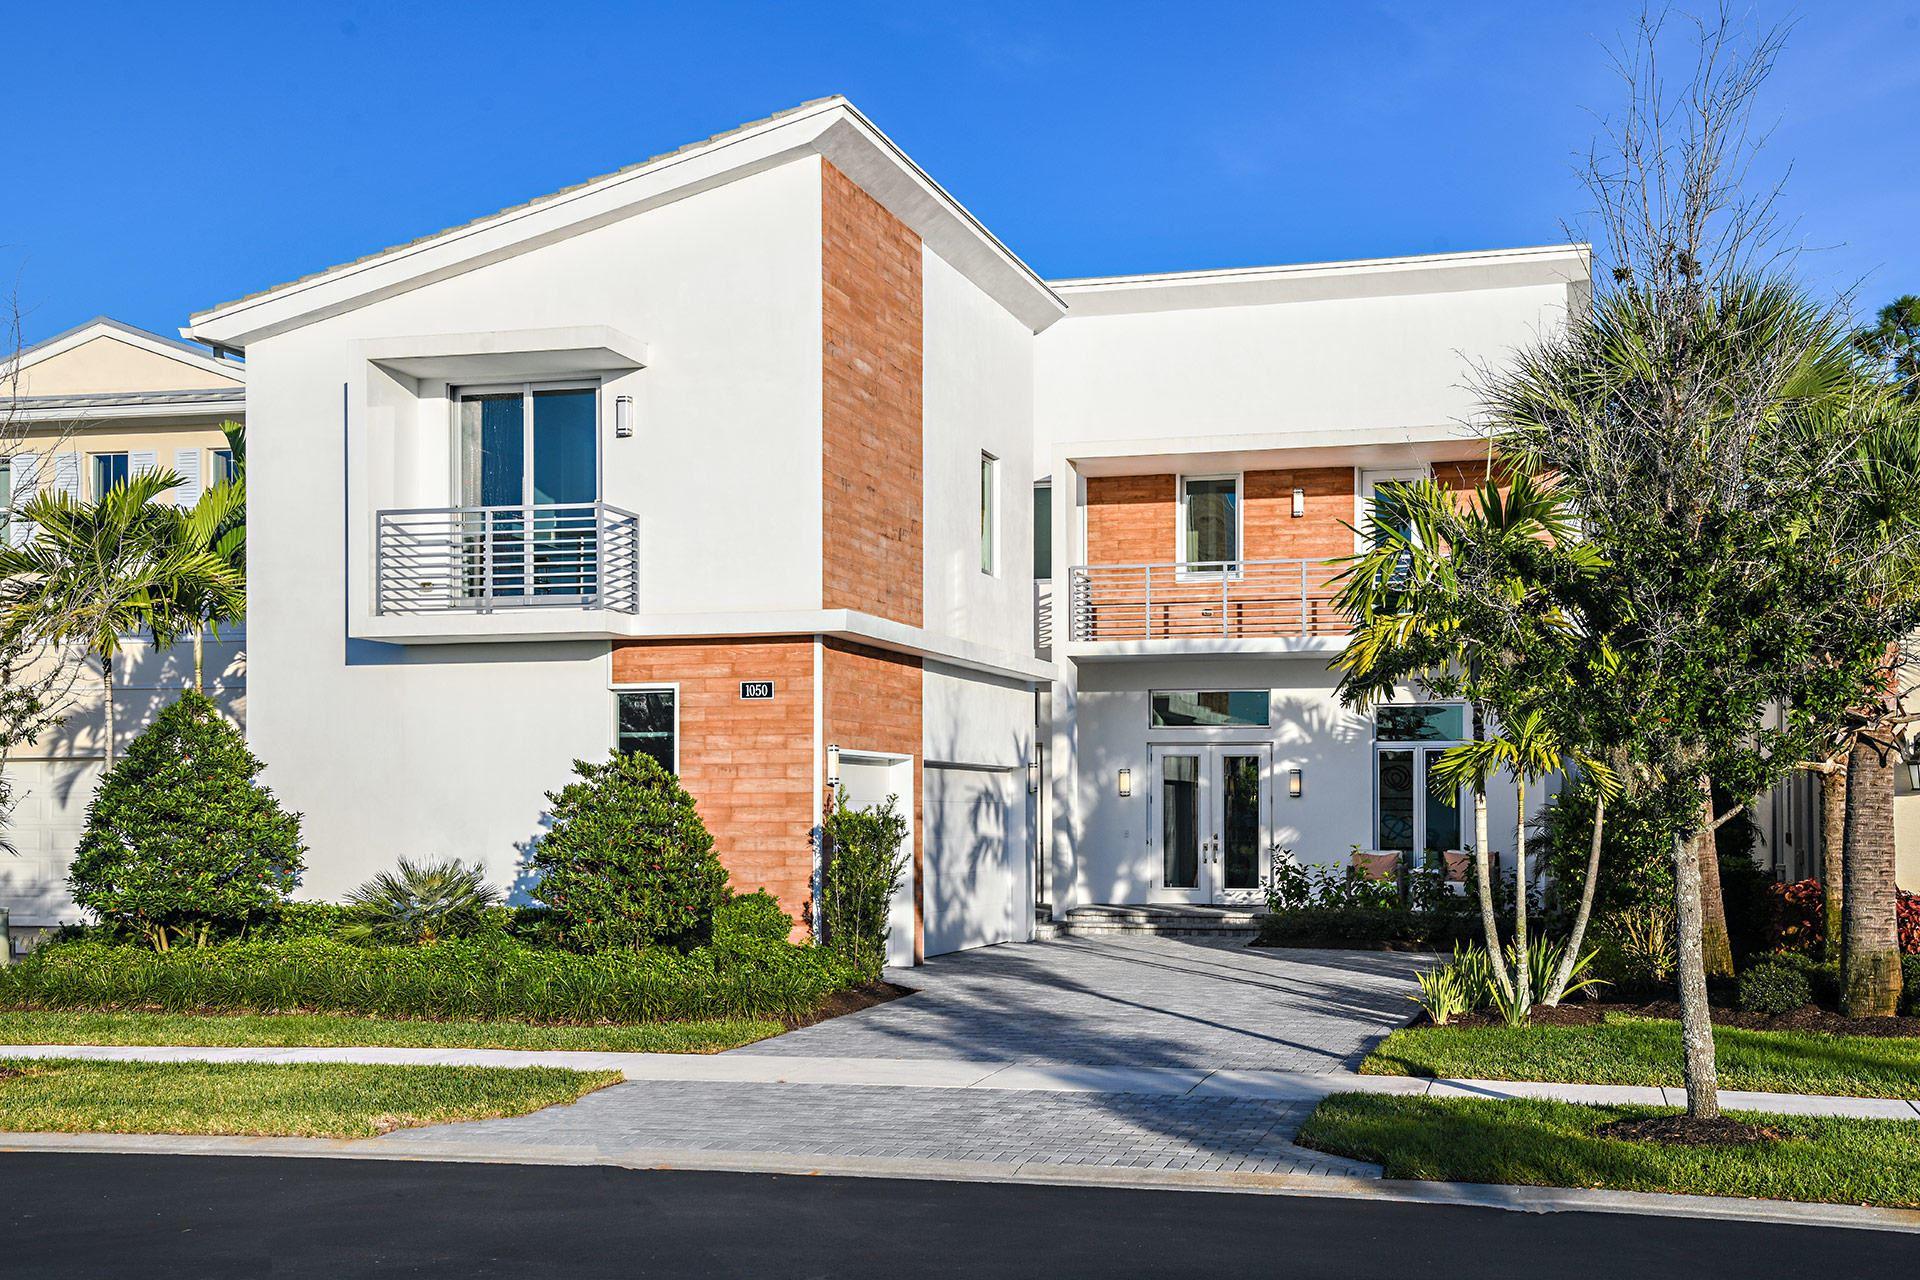 Photo of 1050 Faulkner Terrace, Palm Beach Gardens, FL 33418 (MLS # RX-10708413)